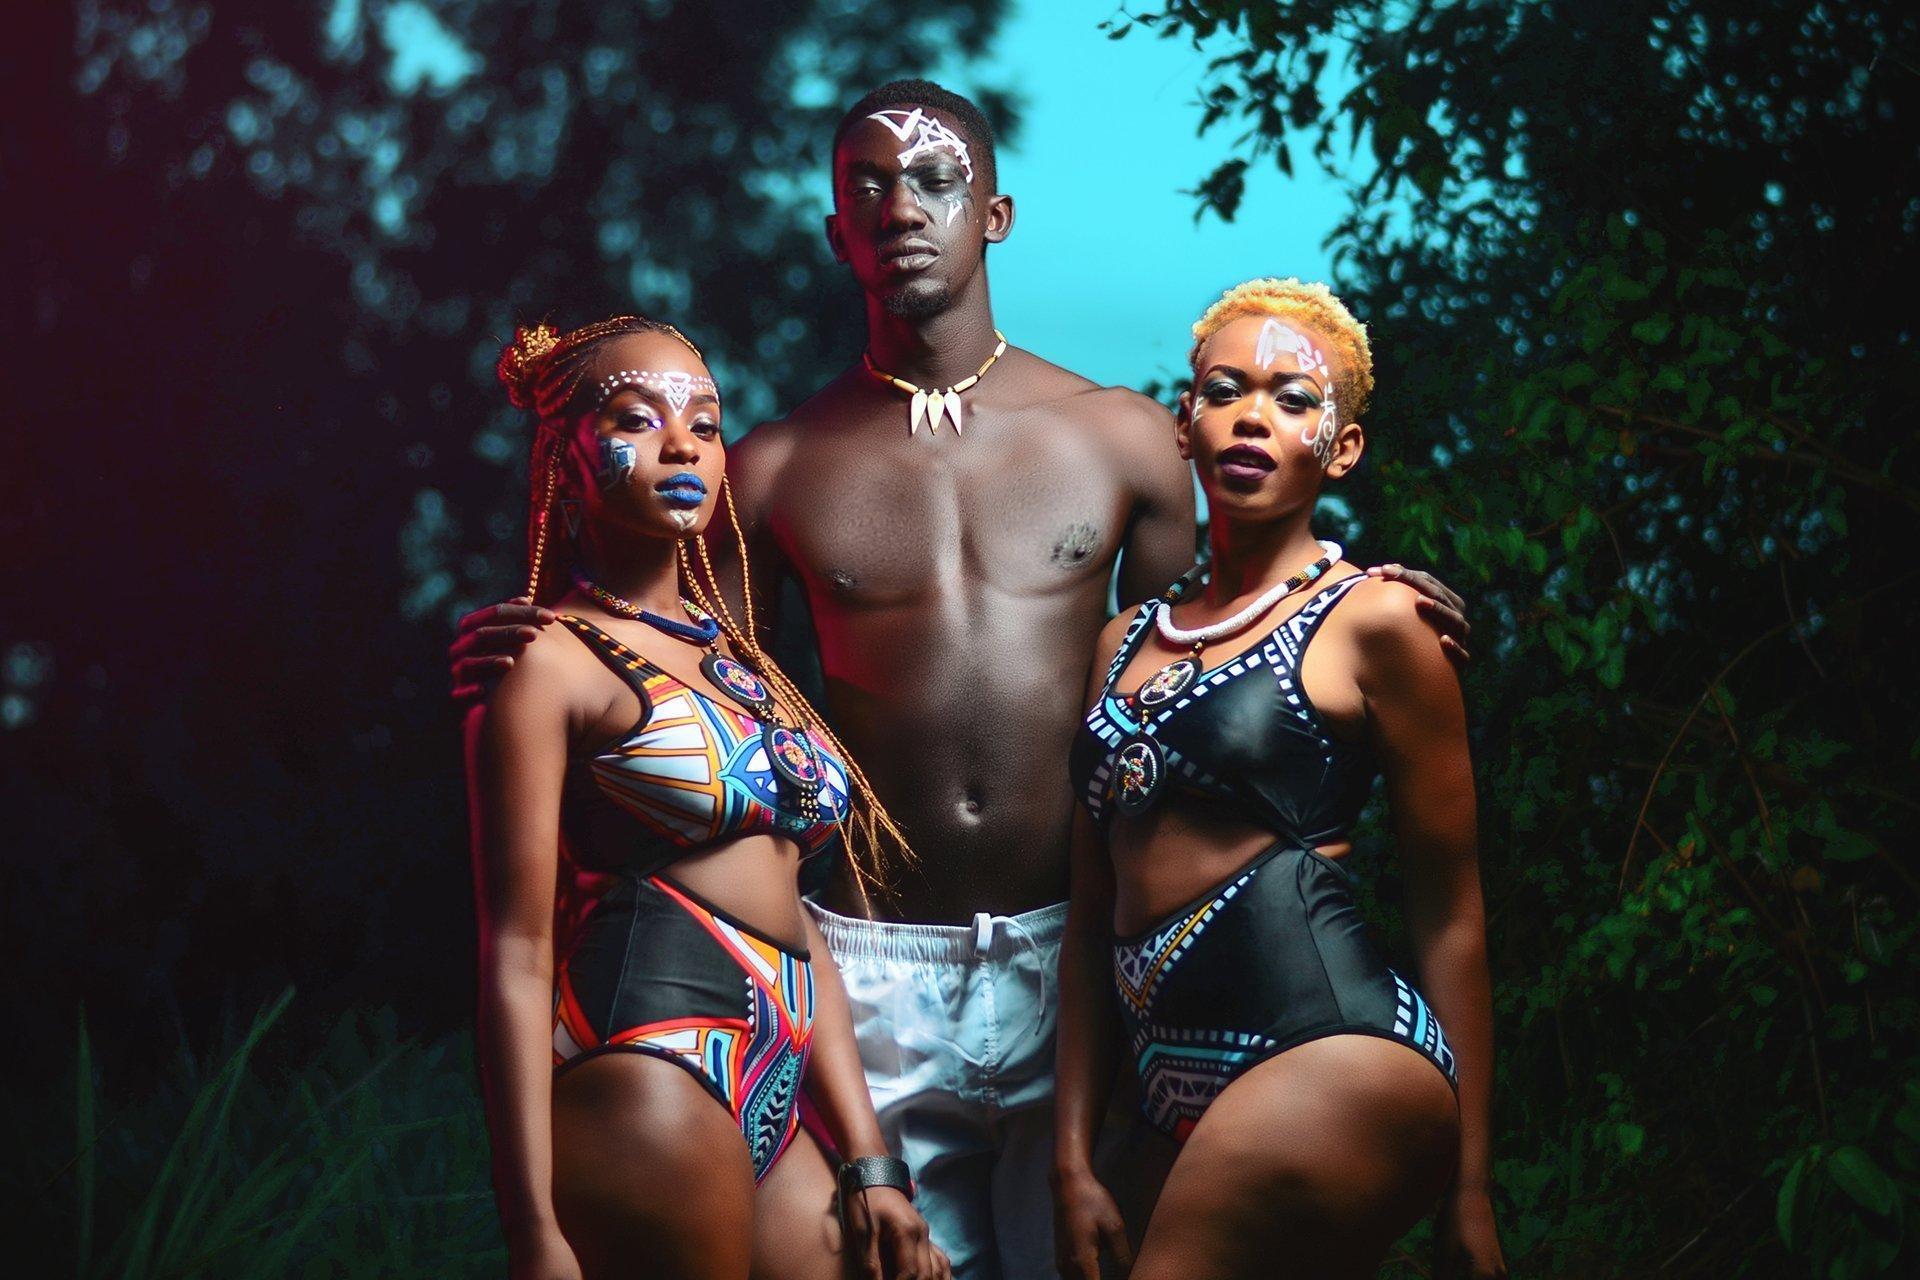 Ohana family models